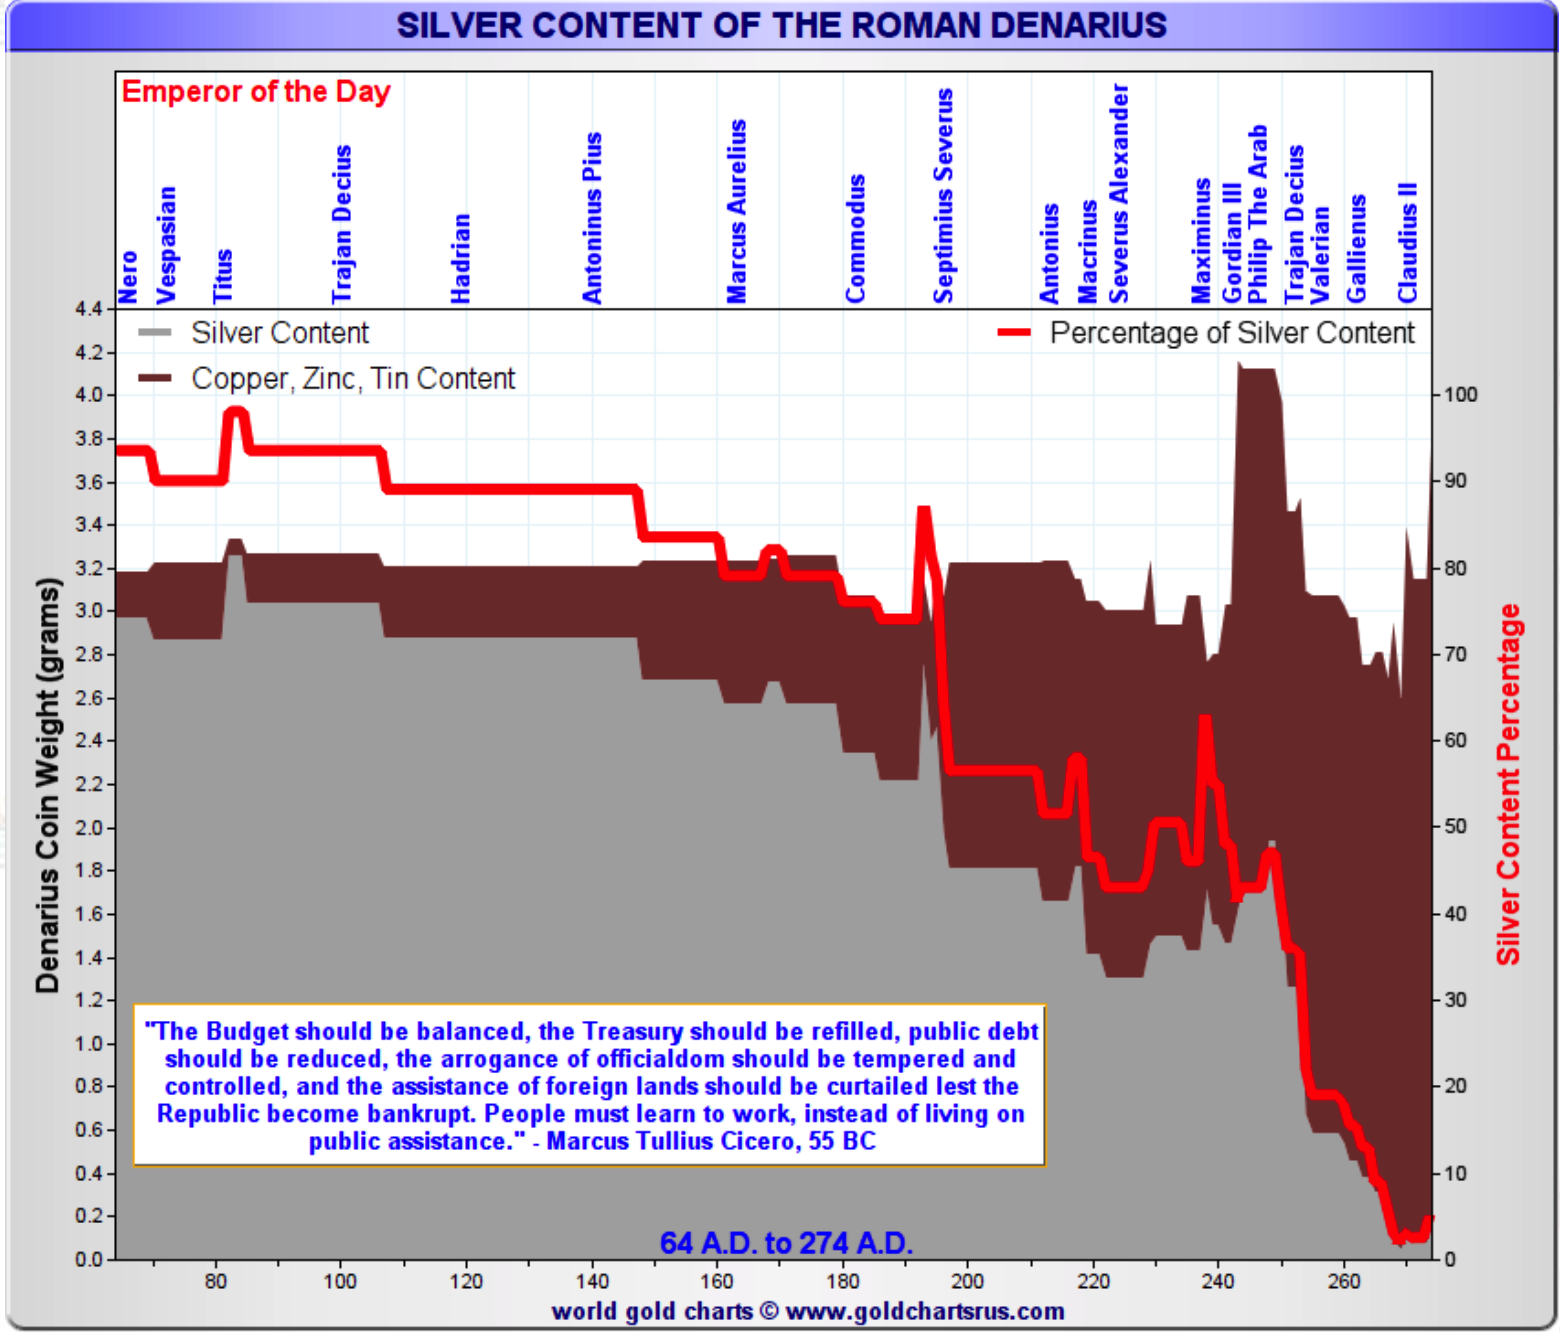 Silver content of the Roman Denarius